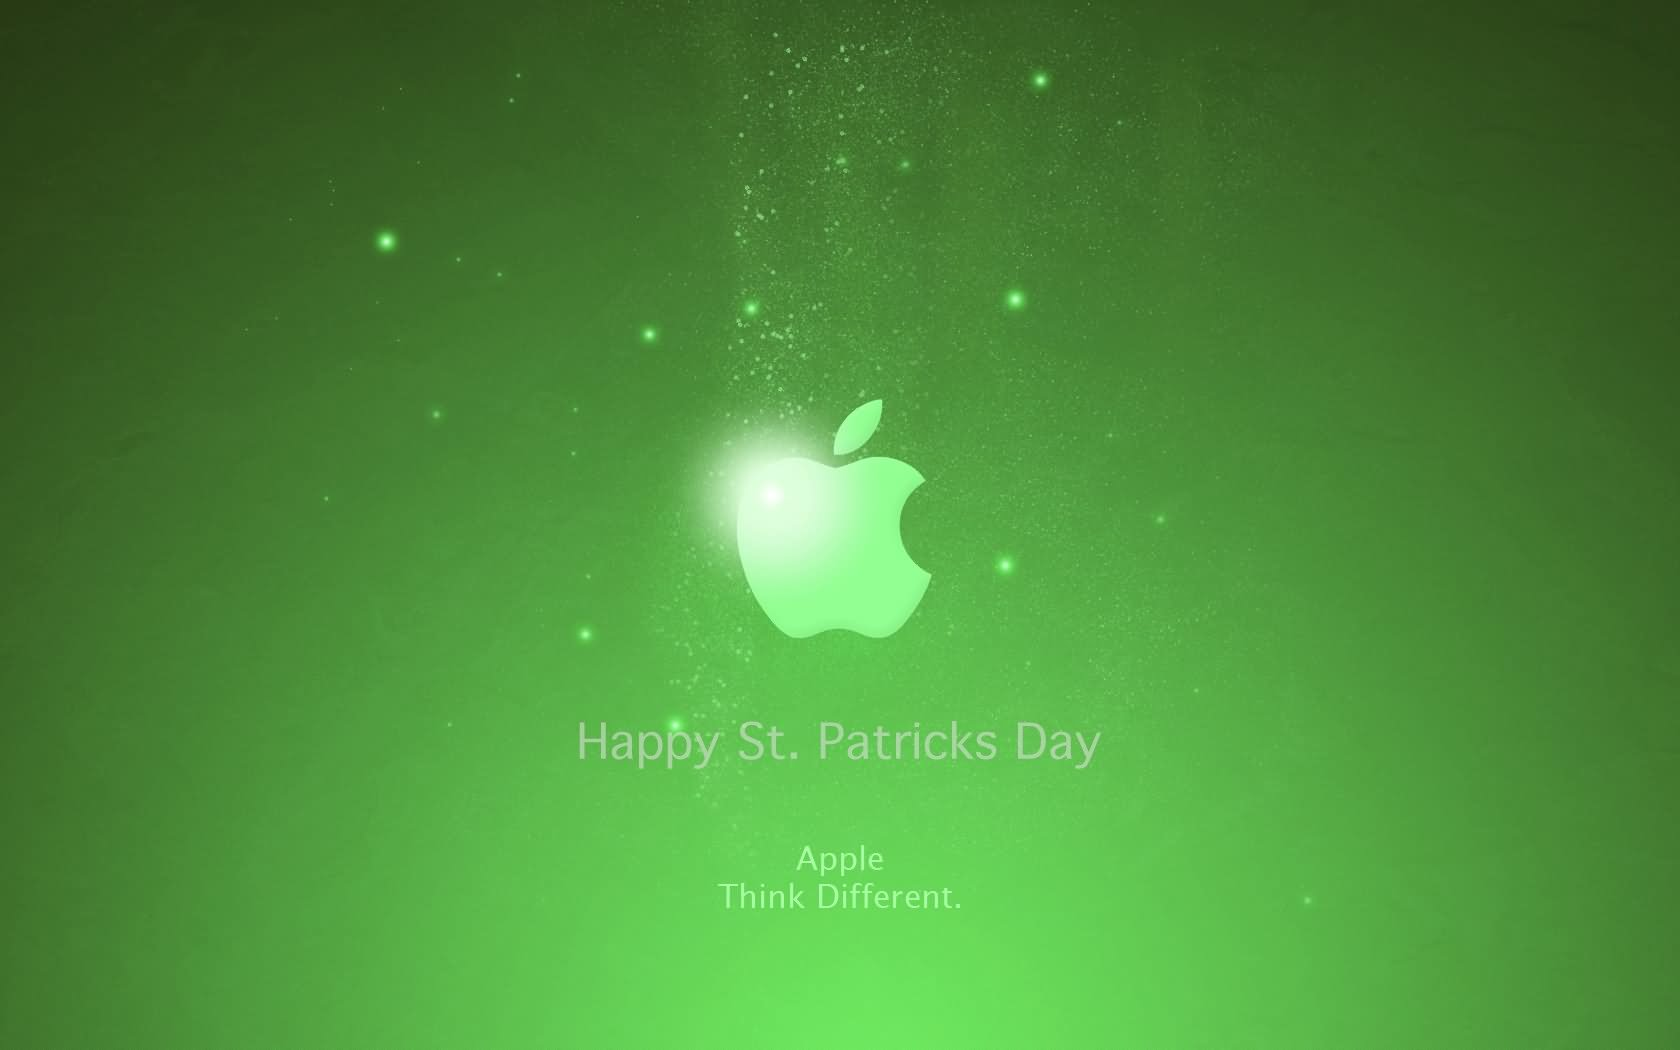 Happy Saint Patrick's Day Apple Logo Wallpaper